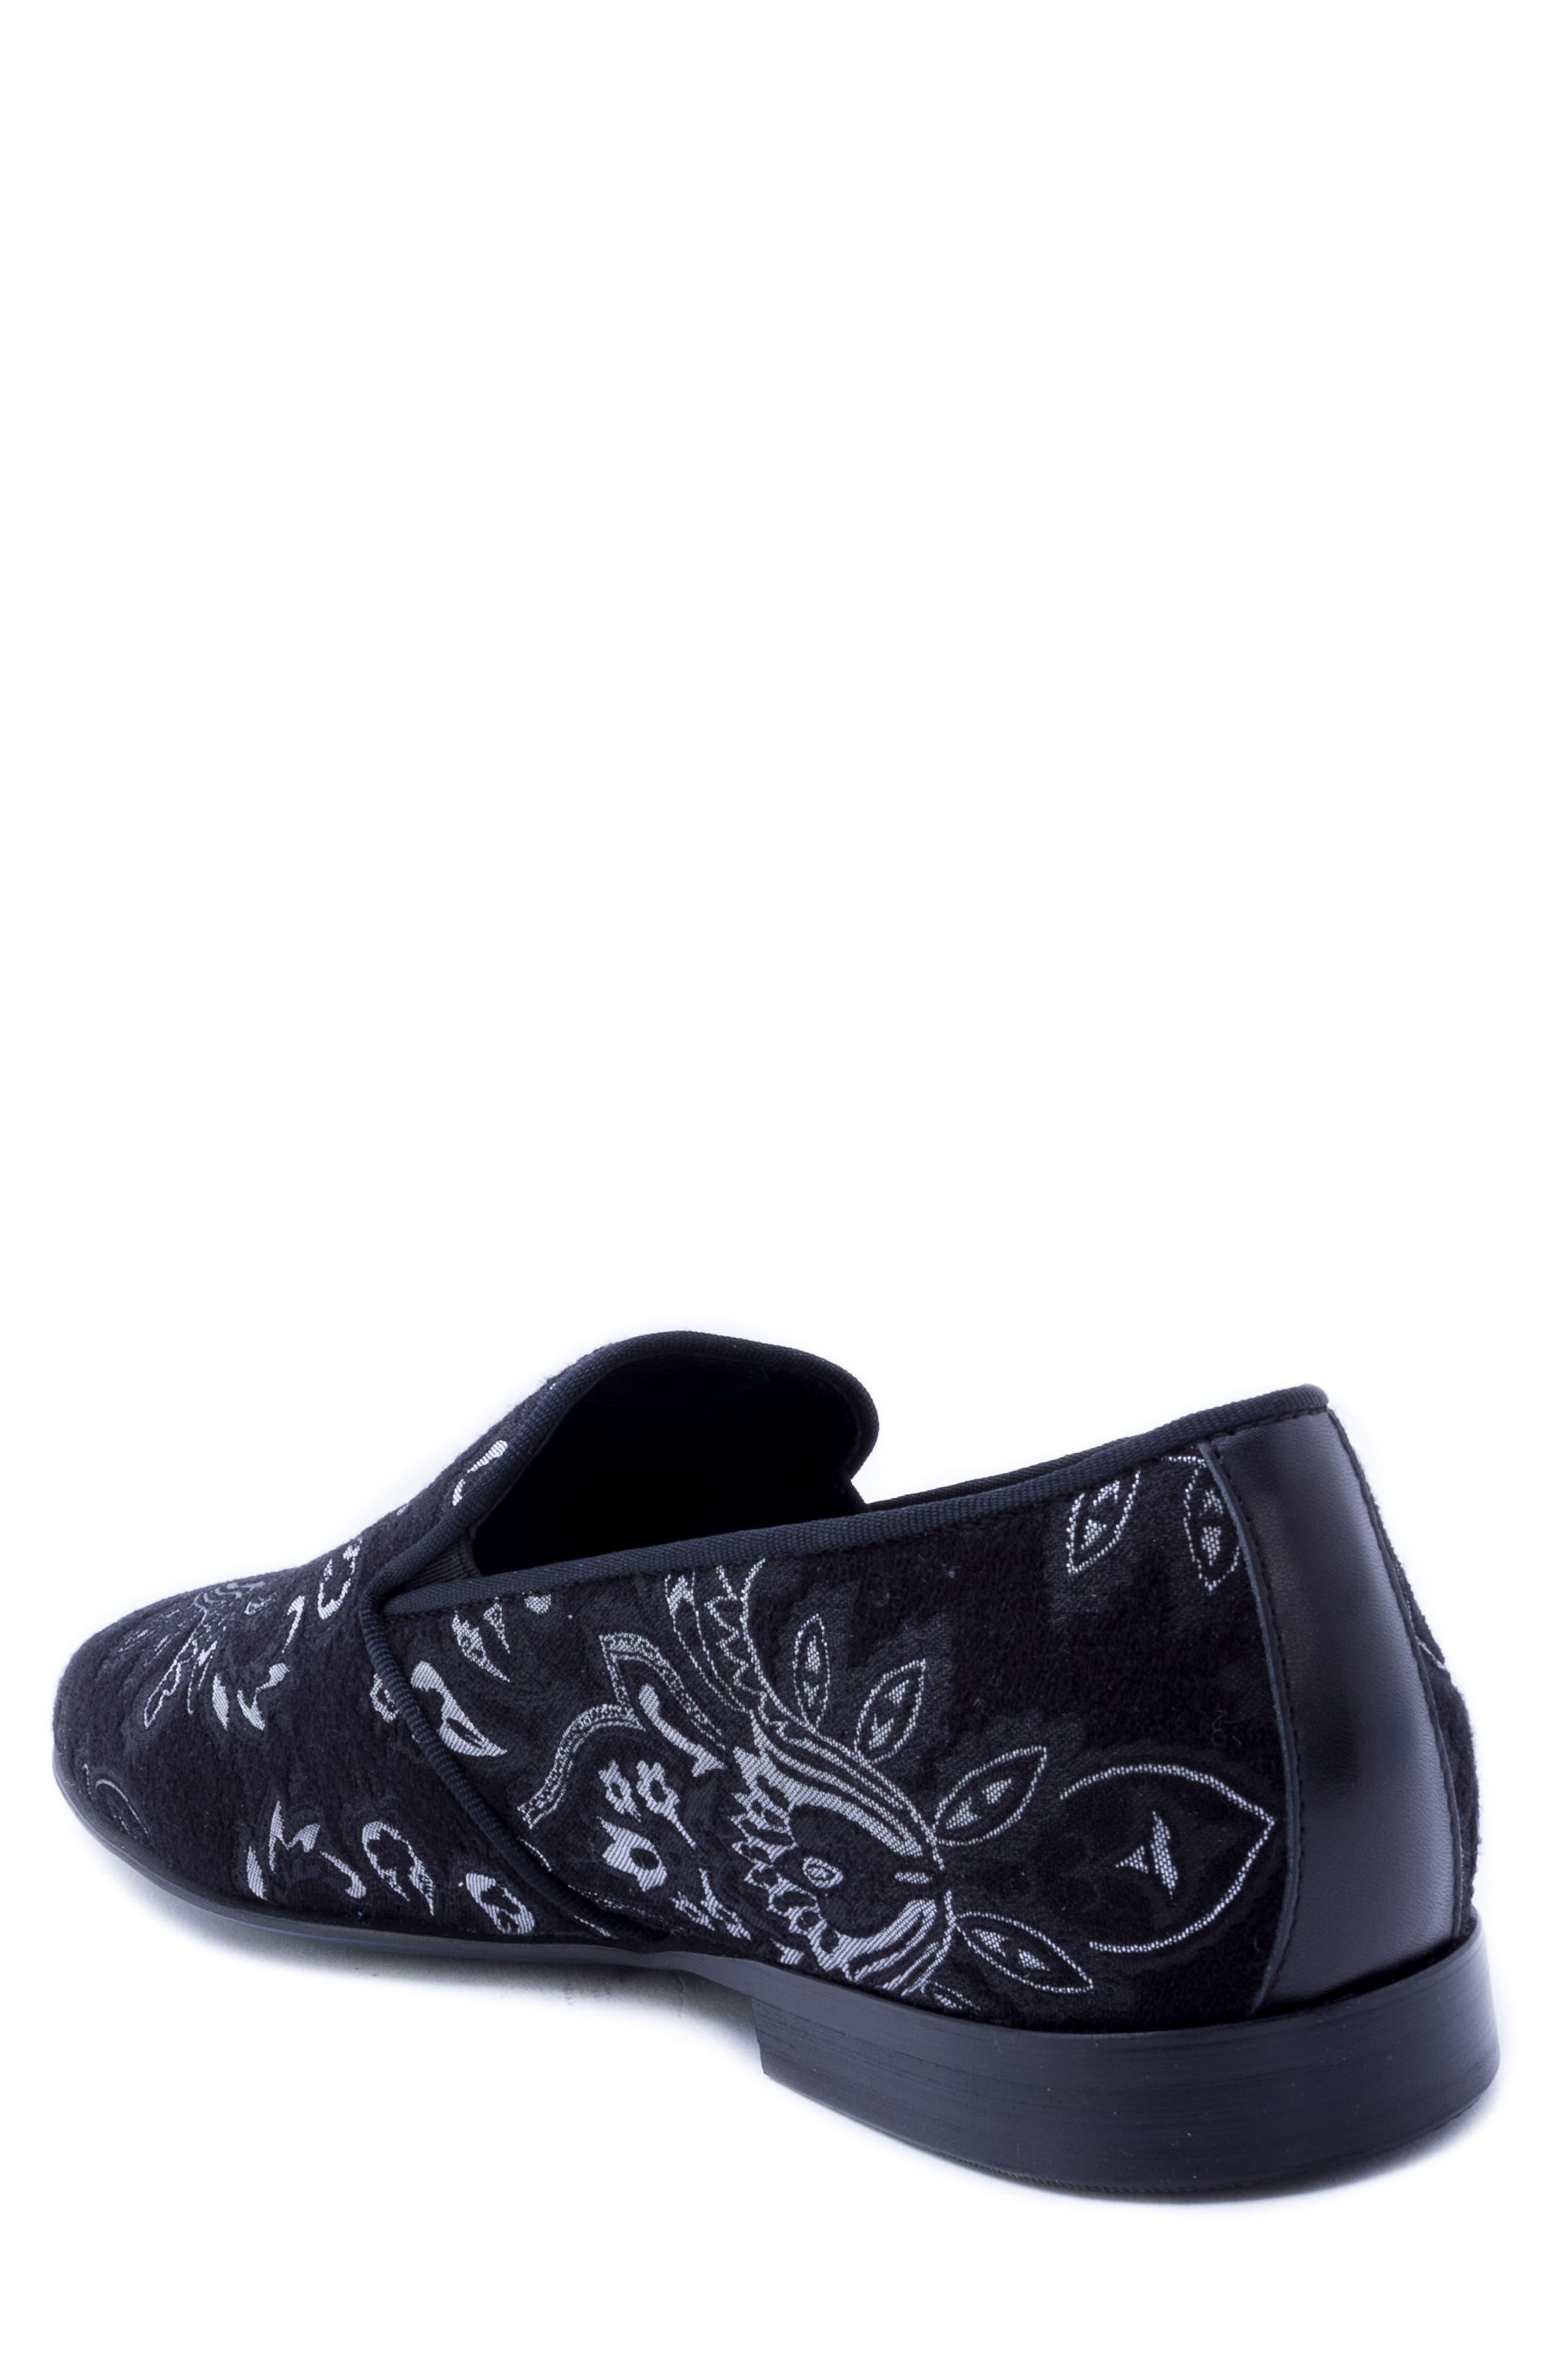 Peck Venetian Loafer,                             Alternate thumbnail 2, color,                             BLACK FABRIC